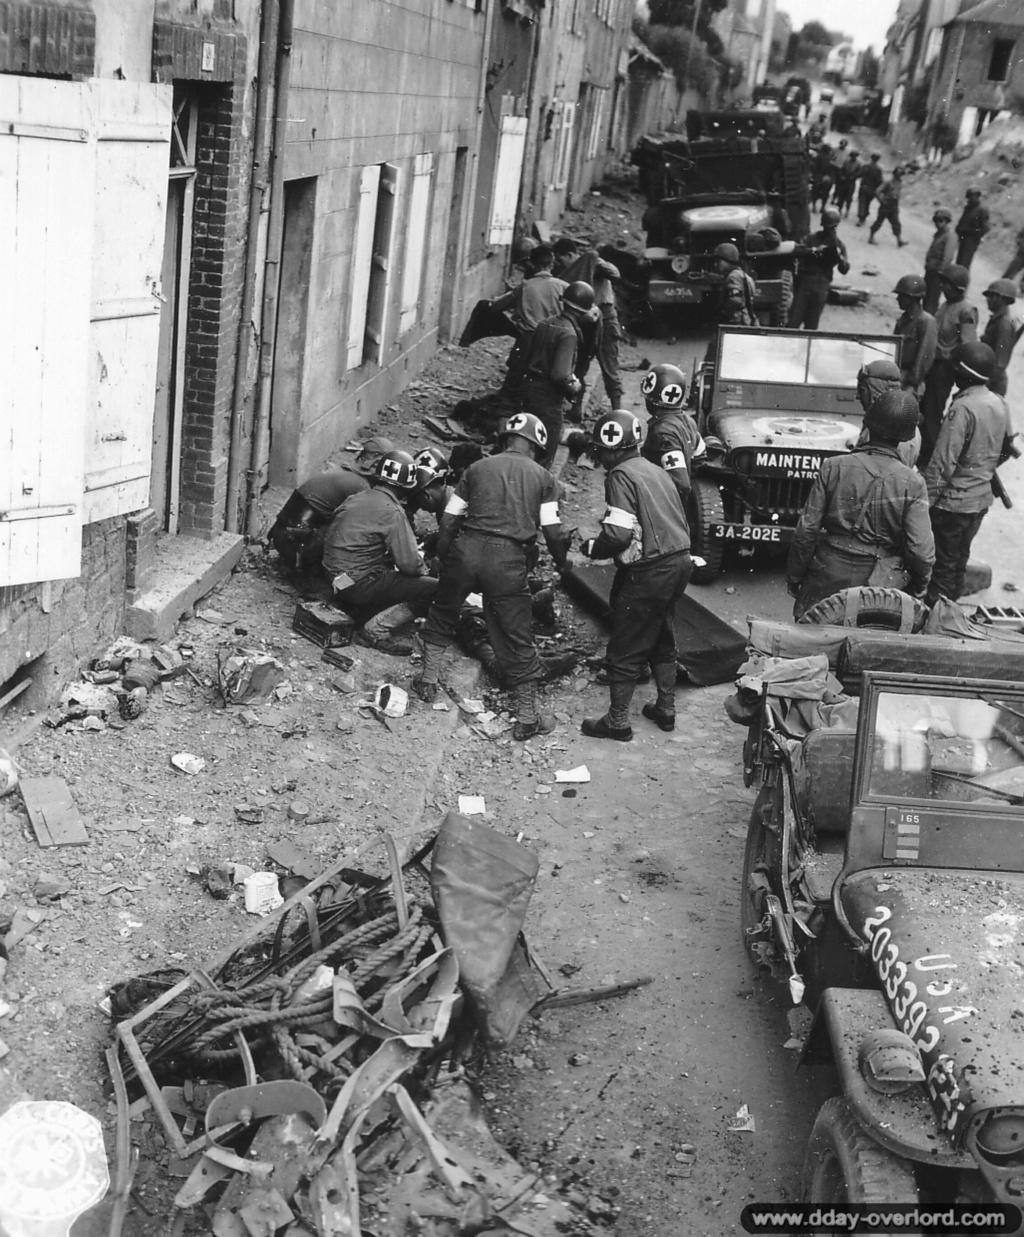 Diverses photos de la WWII - Page 37 24522